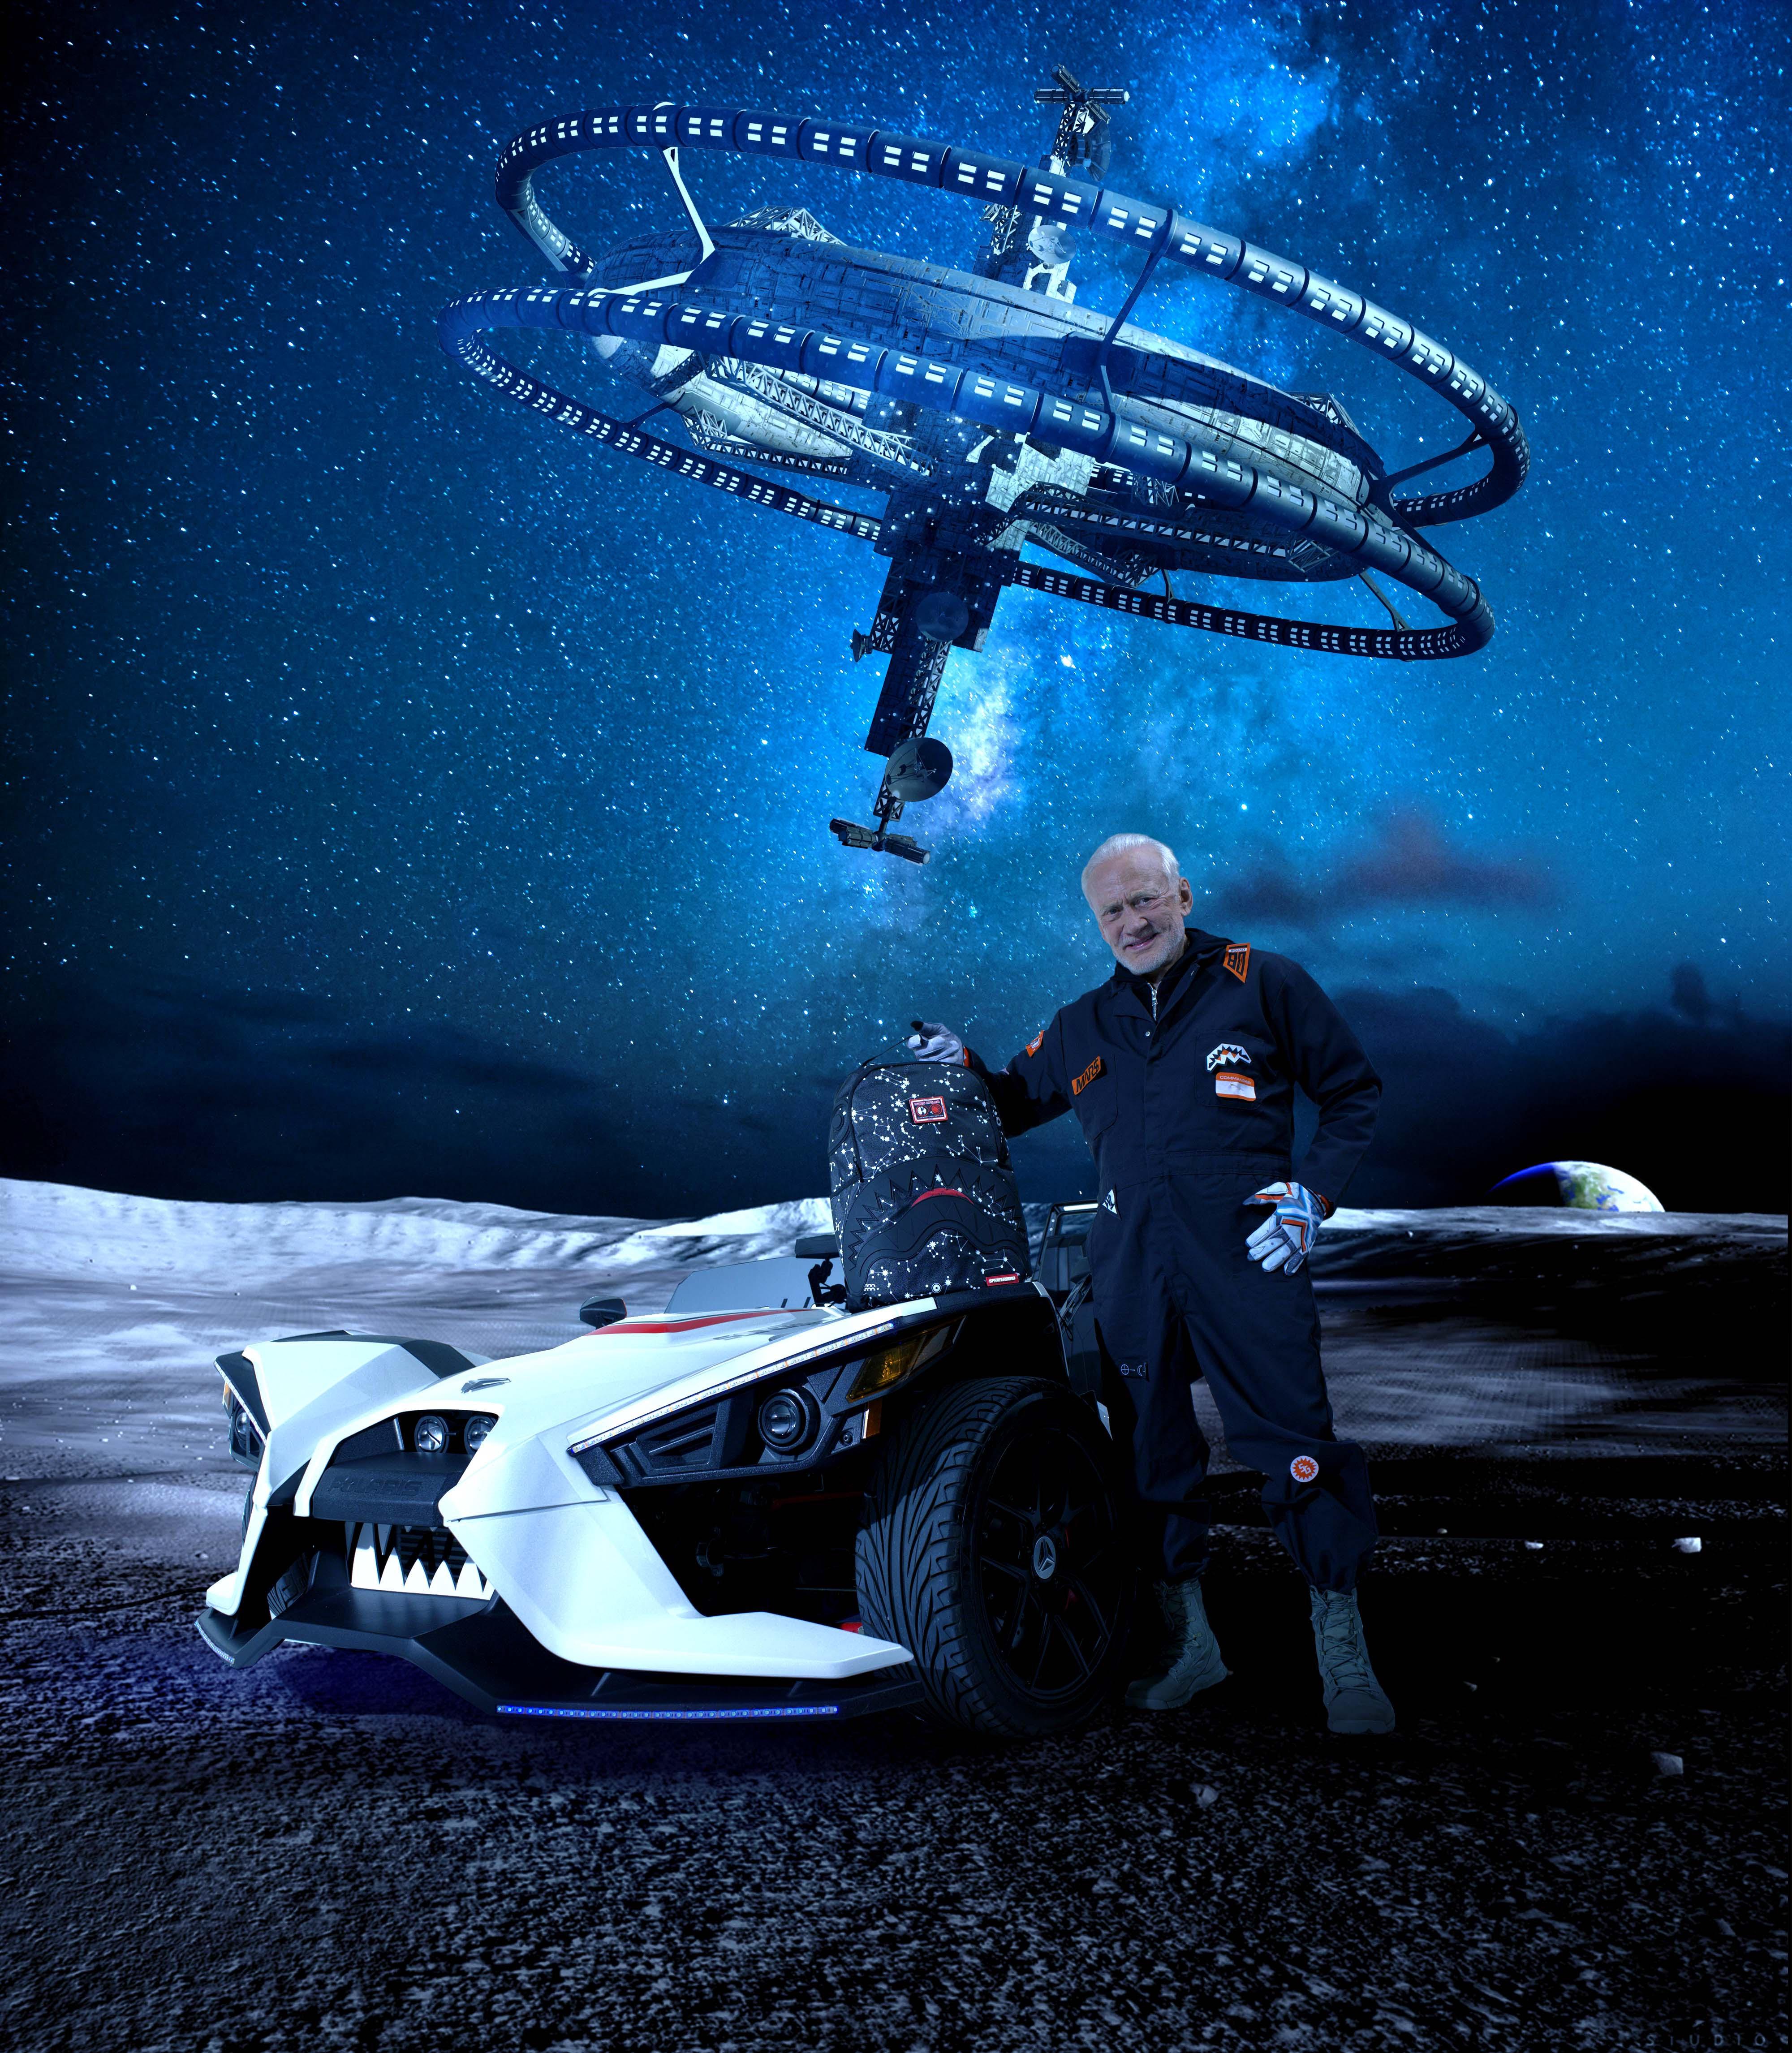 Sprayground's Buzz Aldrin Collaboration Celebrates Space